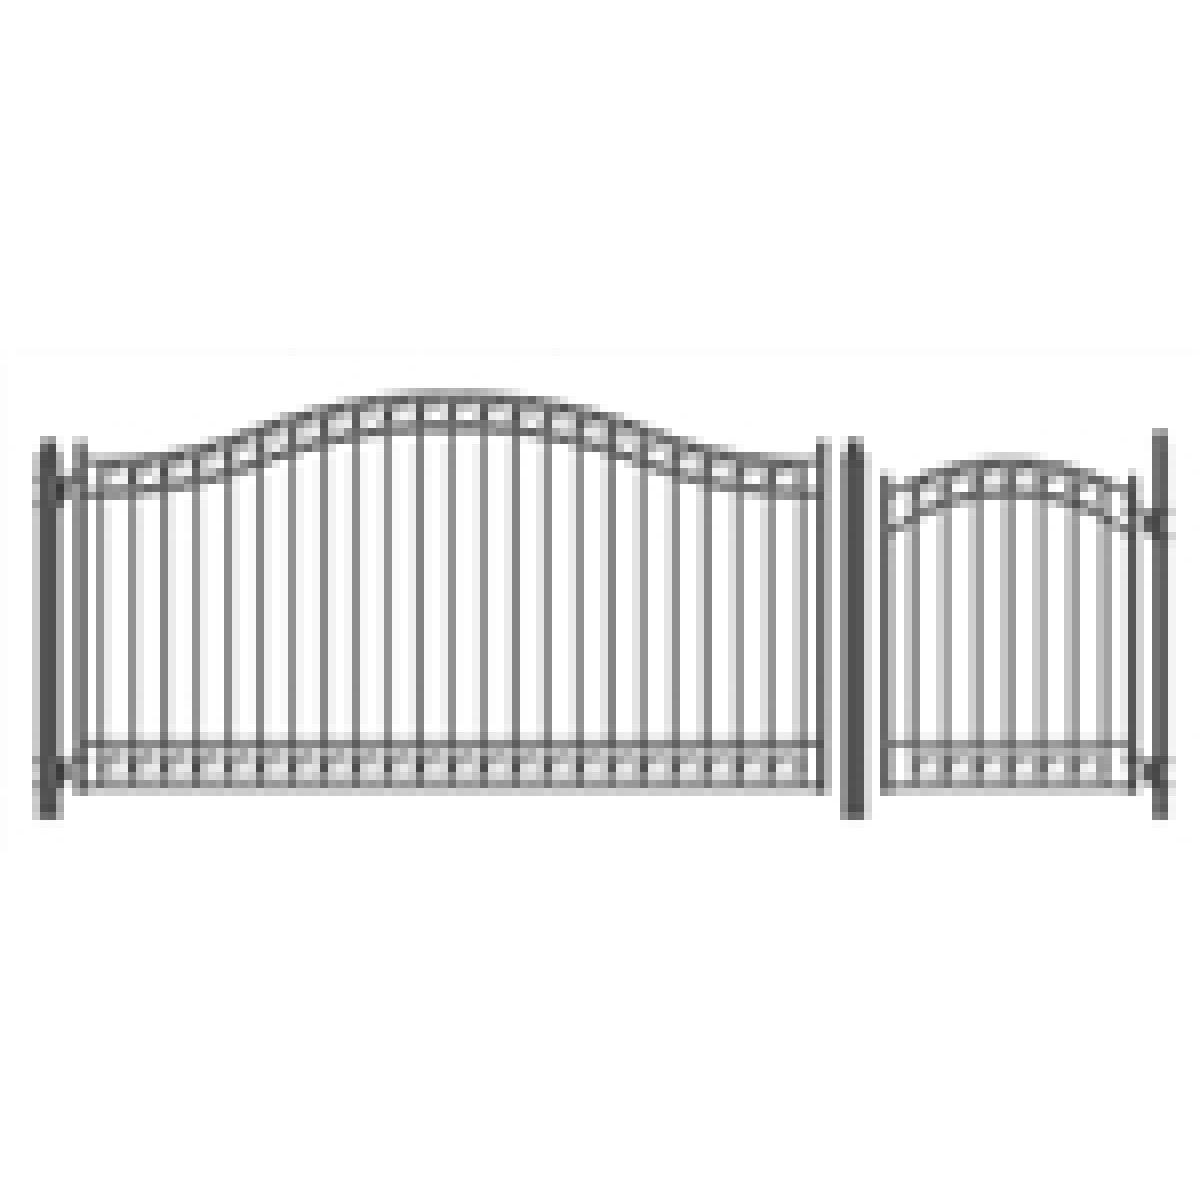 Dublin Style Swing Dual Driveway Gates 12 X 6 1 4 Driveway Gate Driveway Entrance Gates Design